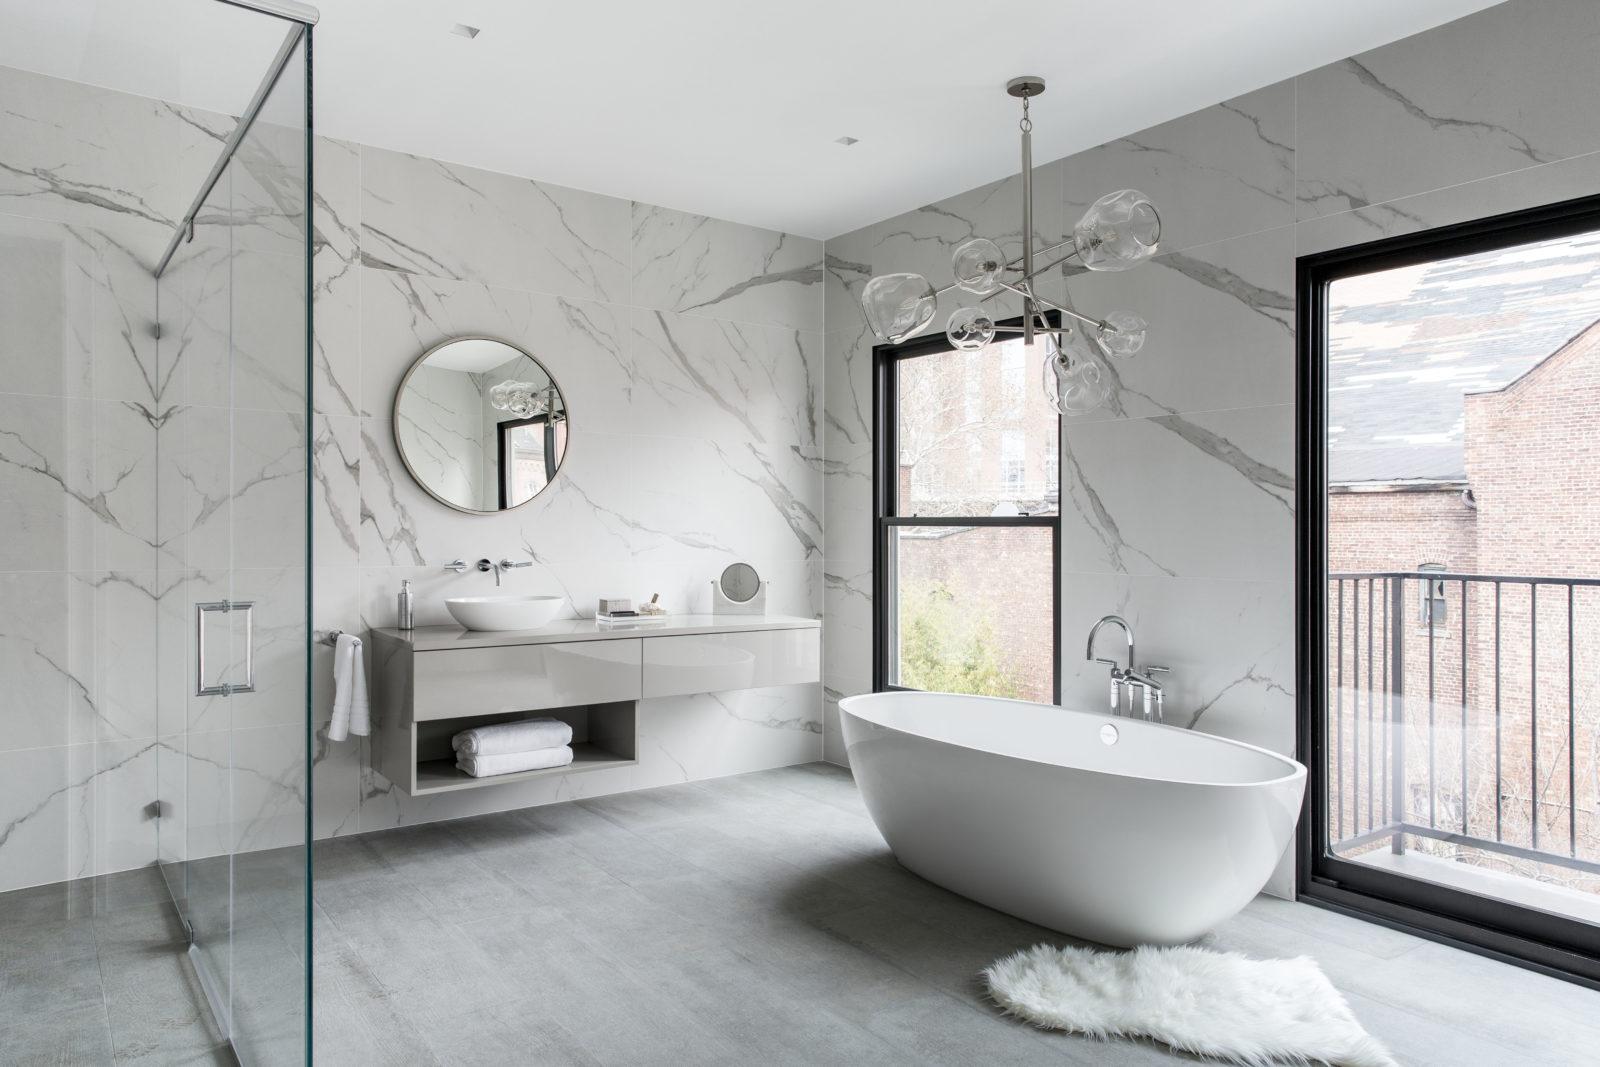 Barcelona Bath - Victoria & Albert